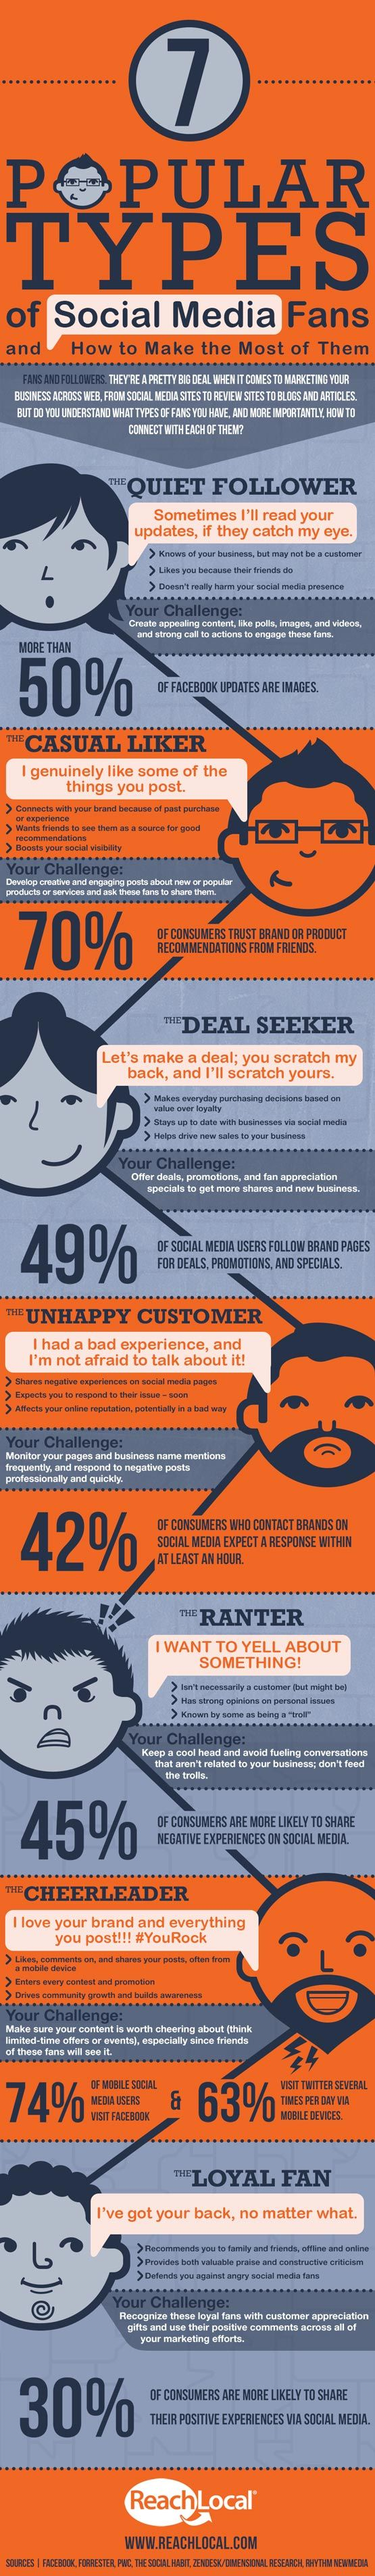 Social Media Typologie